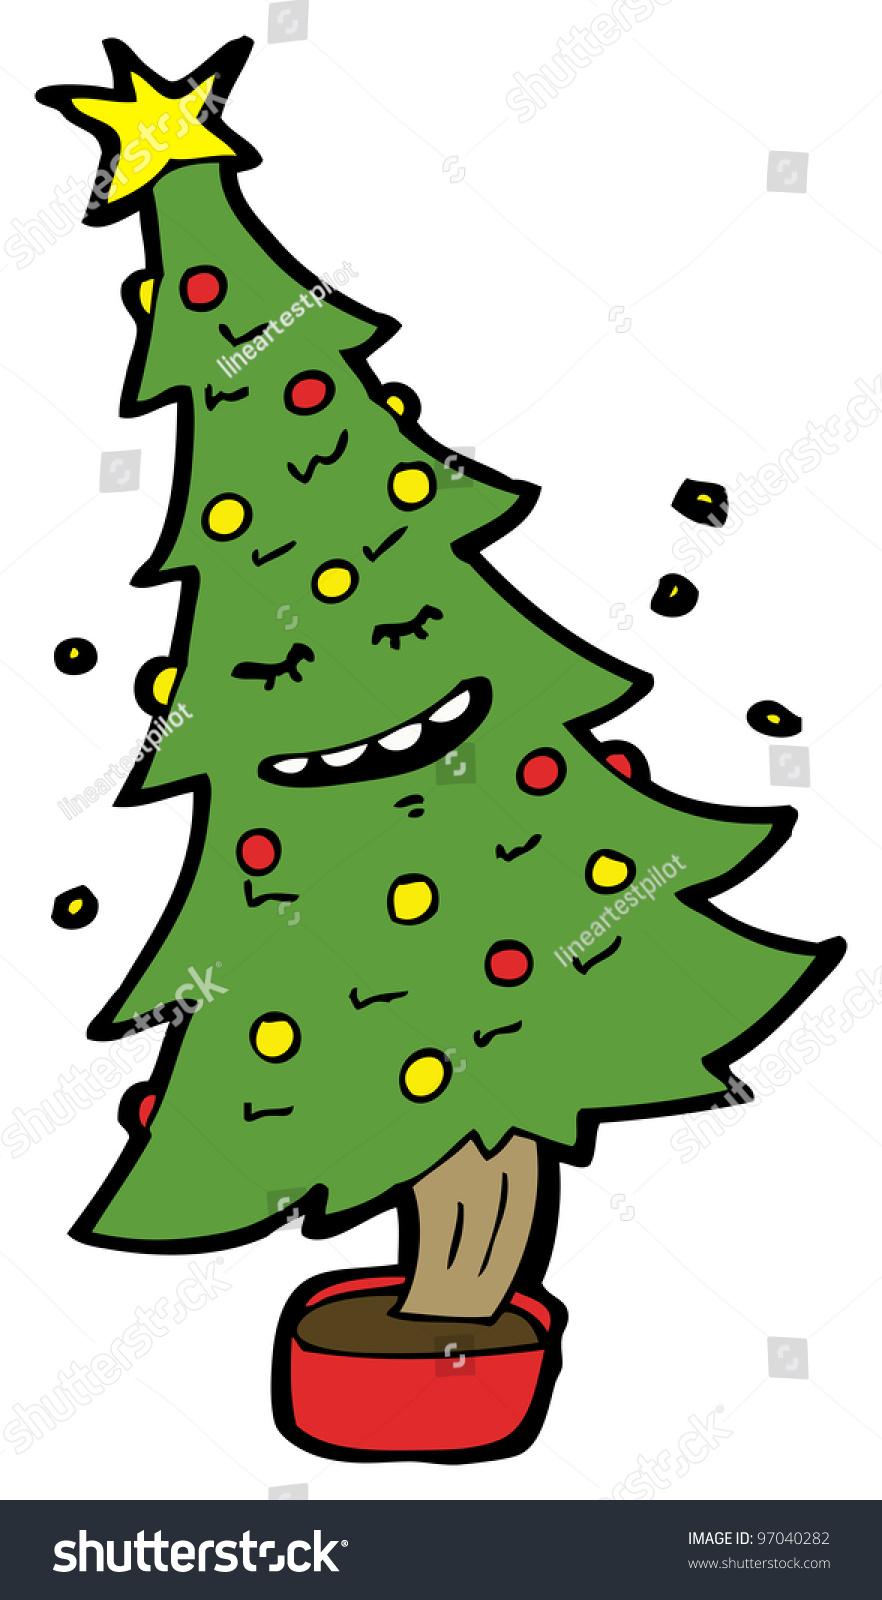 dancing christmas tree cartoon stock illustration 97040282